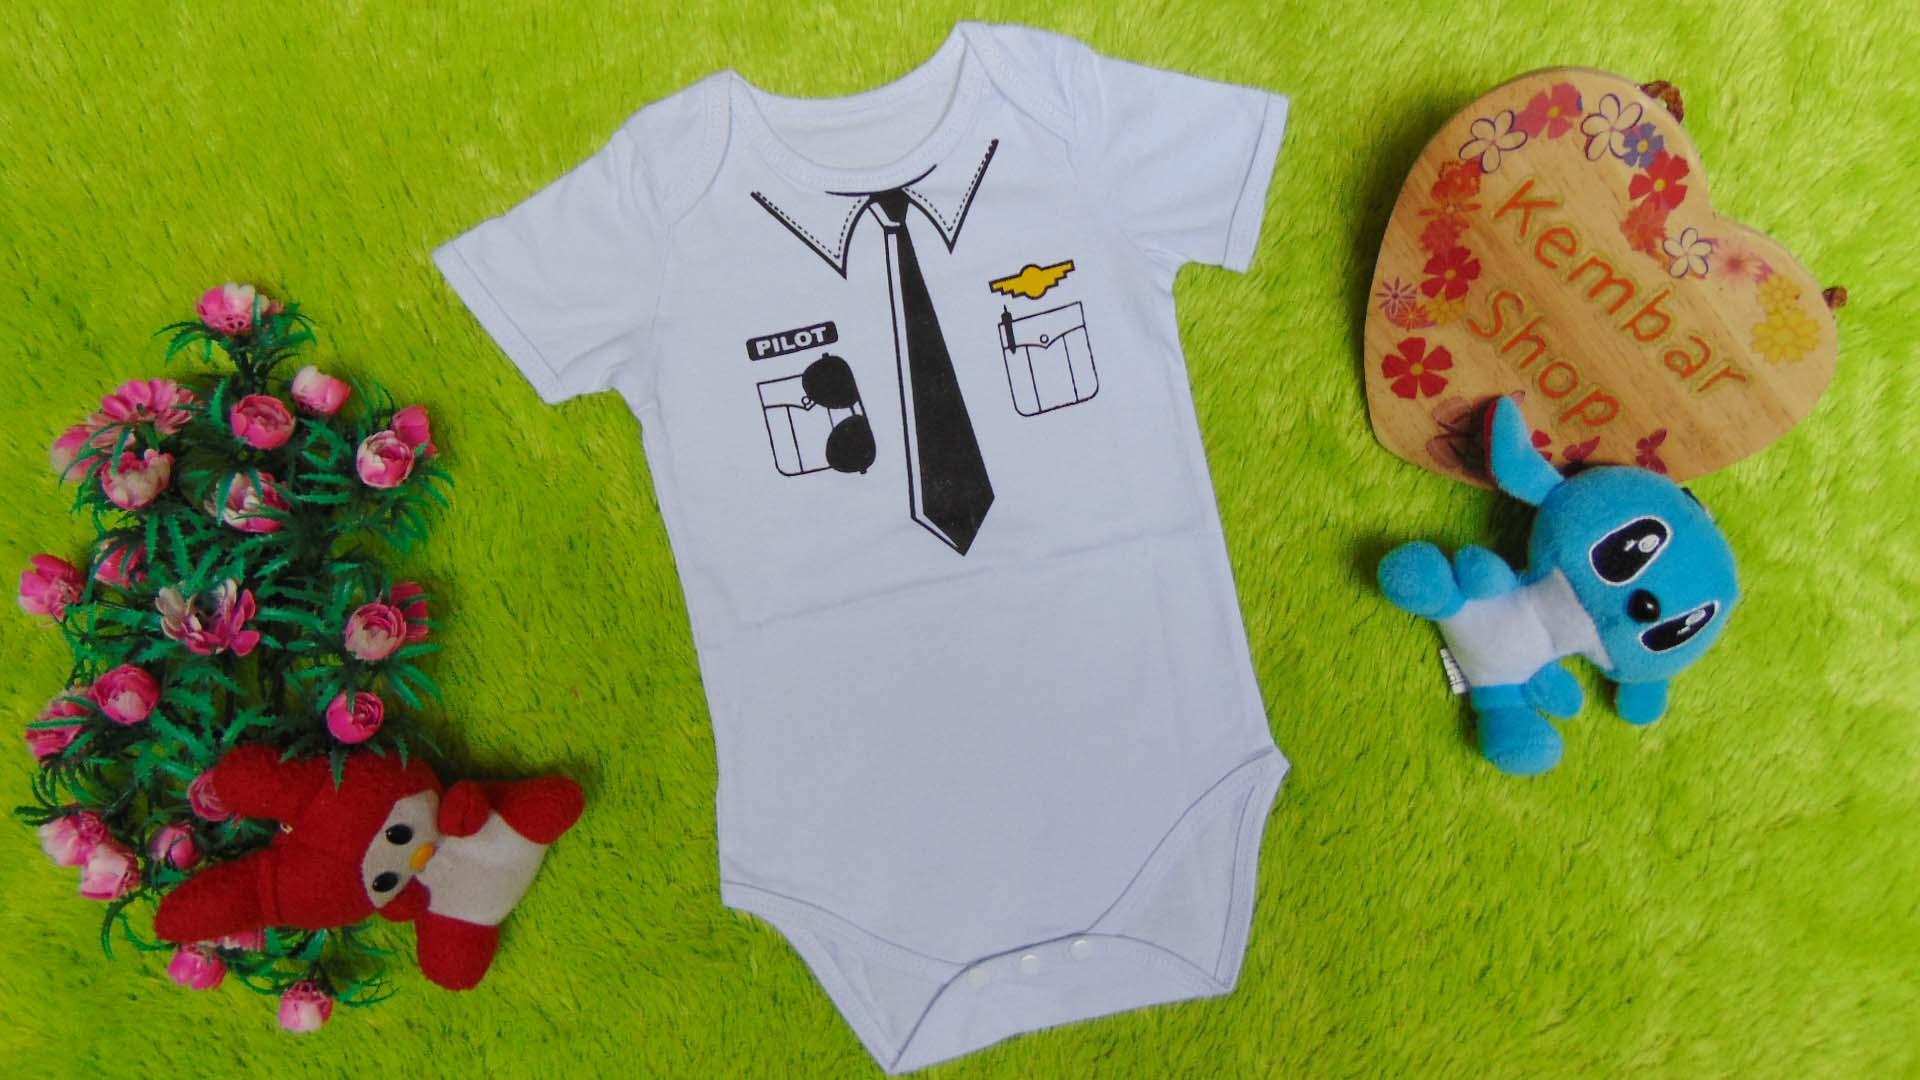 Jumper bayi anak cowok laki-laki newborn 0-9bulan karakter Profesi Pilot